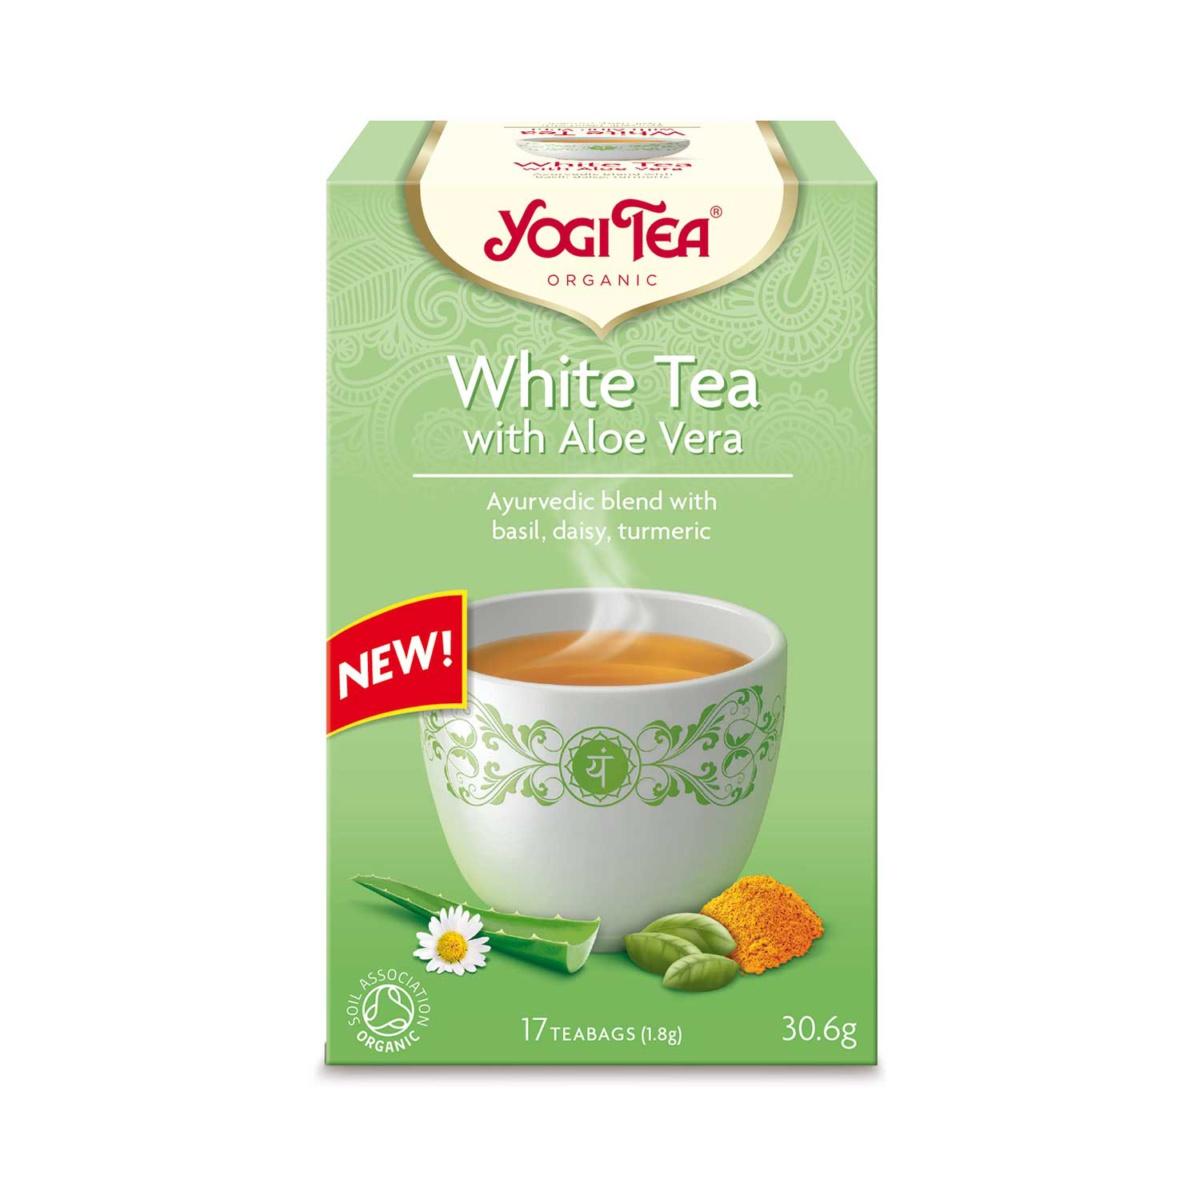 WHITE_TEA_WITH_ALOE_VERA_300dpi_GB-SCAN_P09